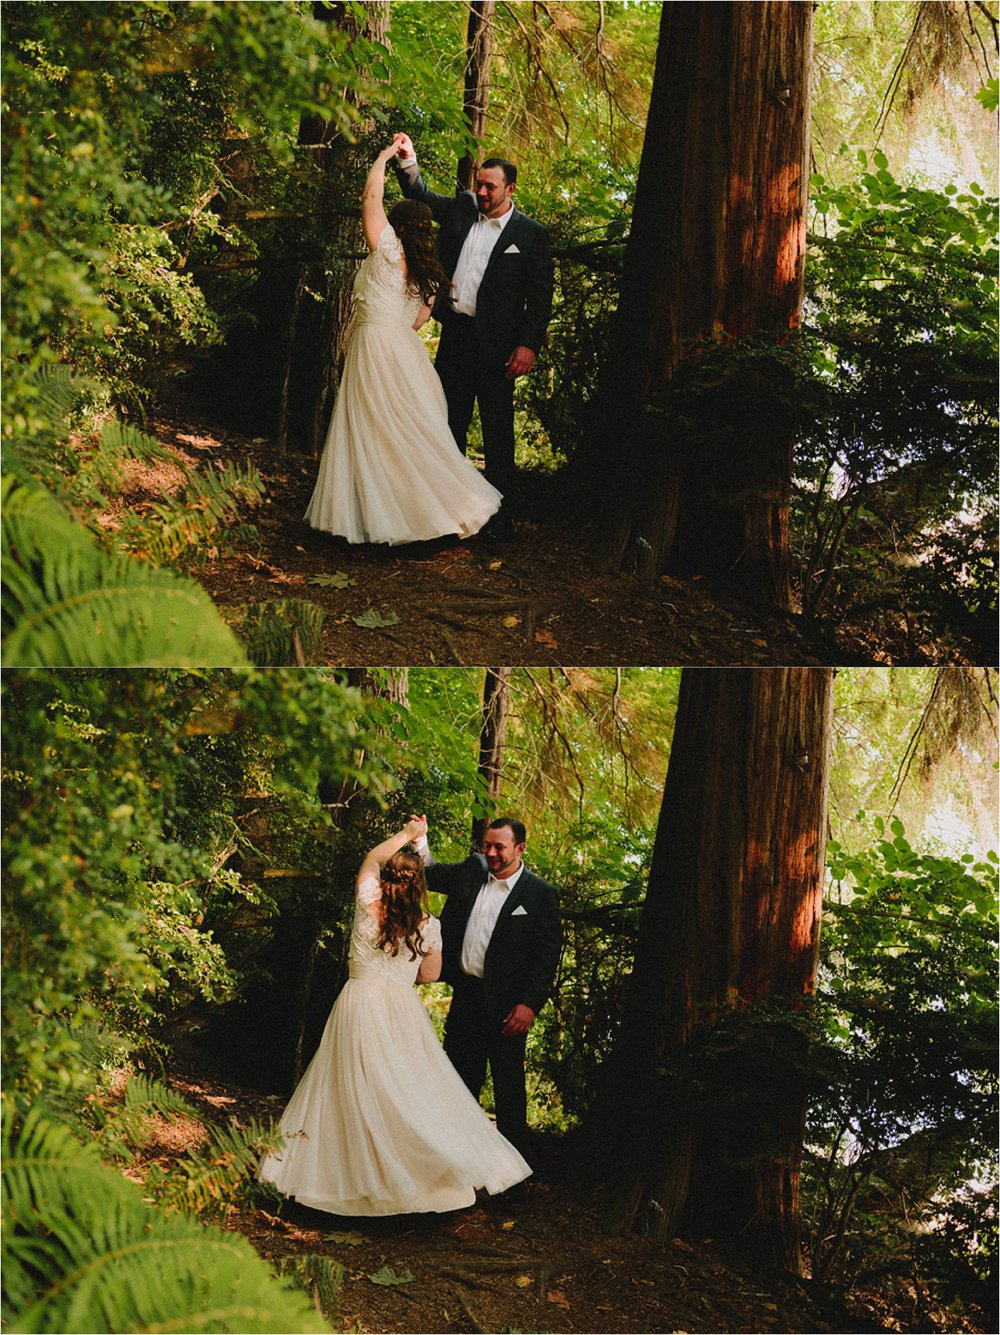 owen-beach-priest-point-park-tacoma-washington-elopement-jannicka-mayte-anchorage-alaska-wedding-elopement-photographer (5).jpg